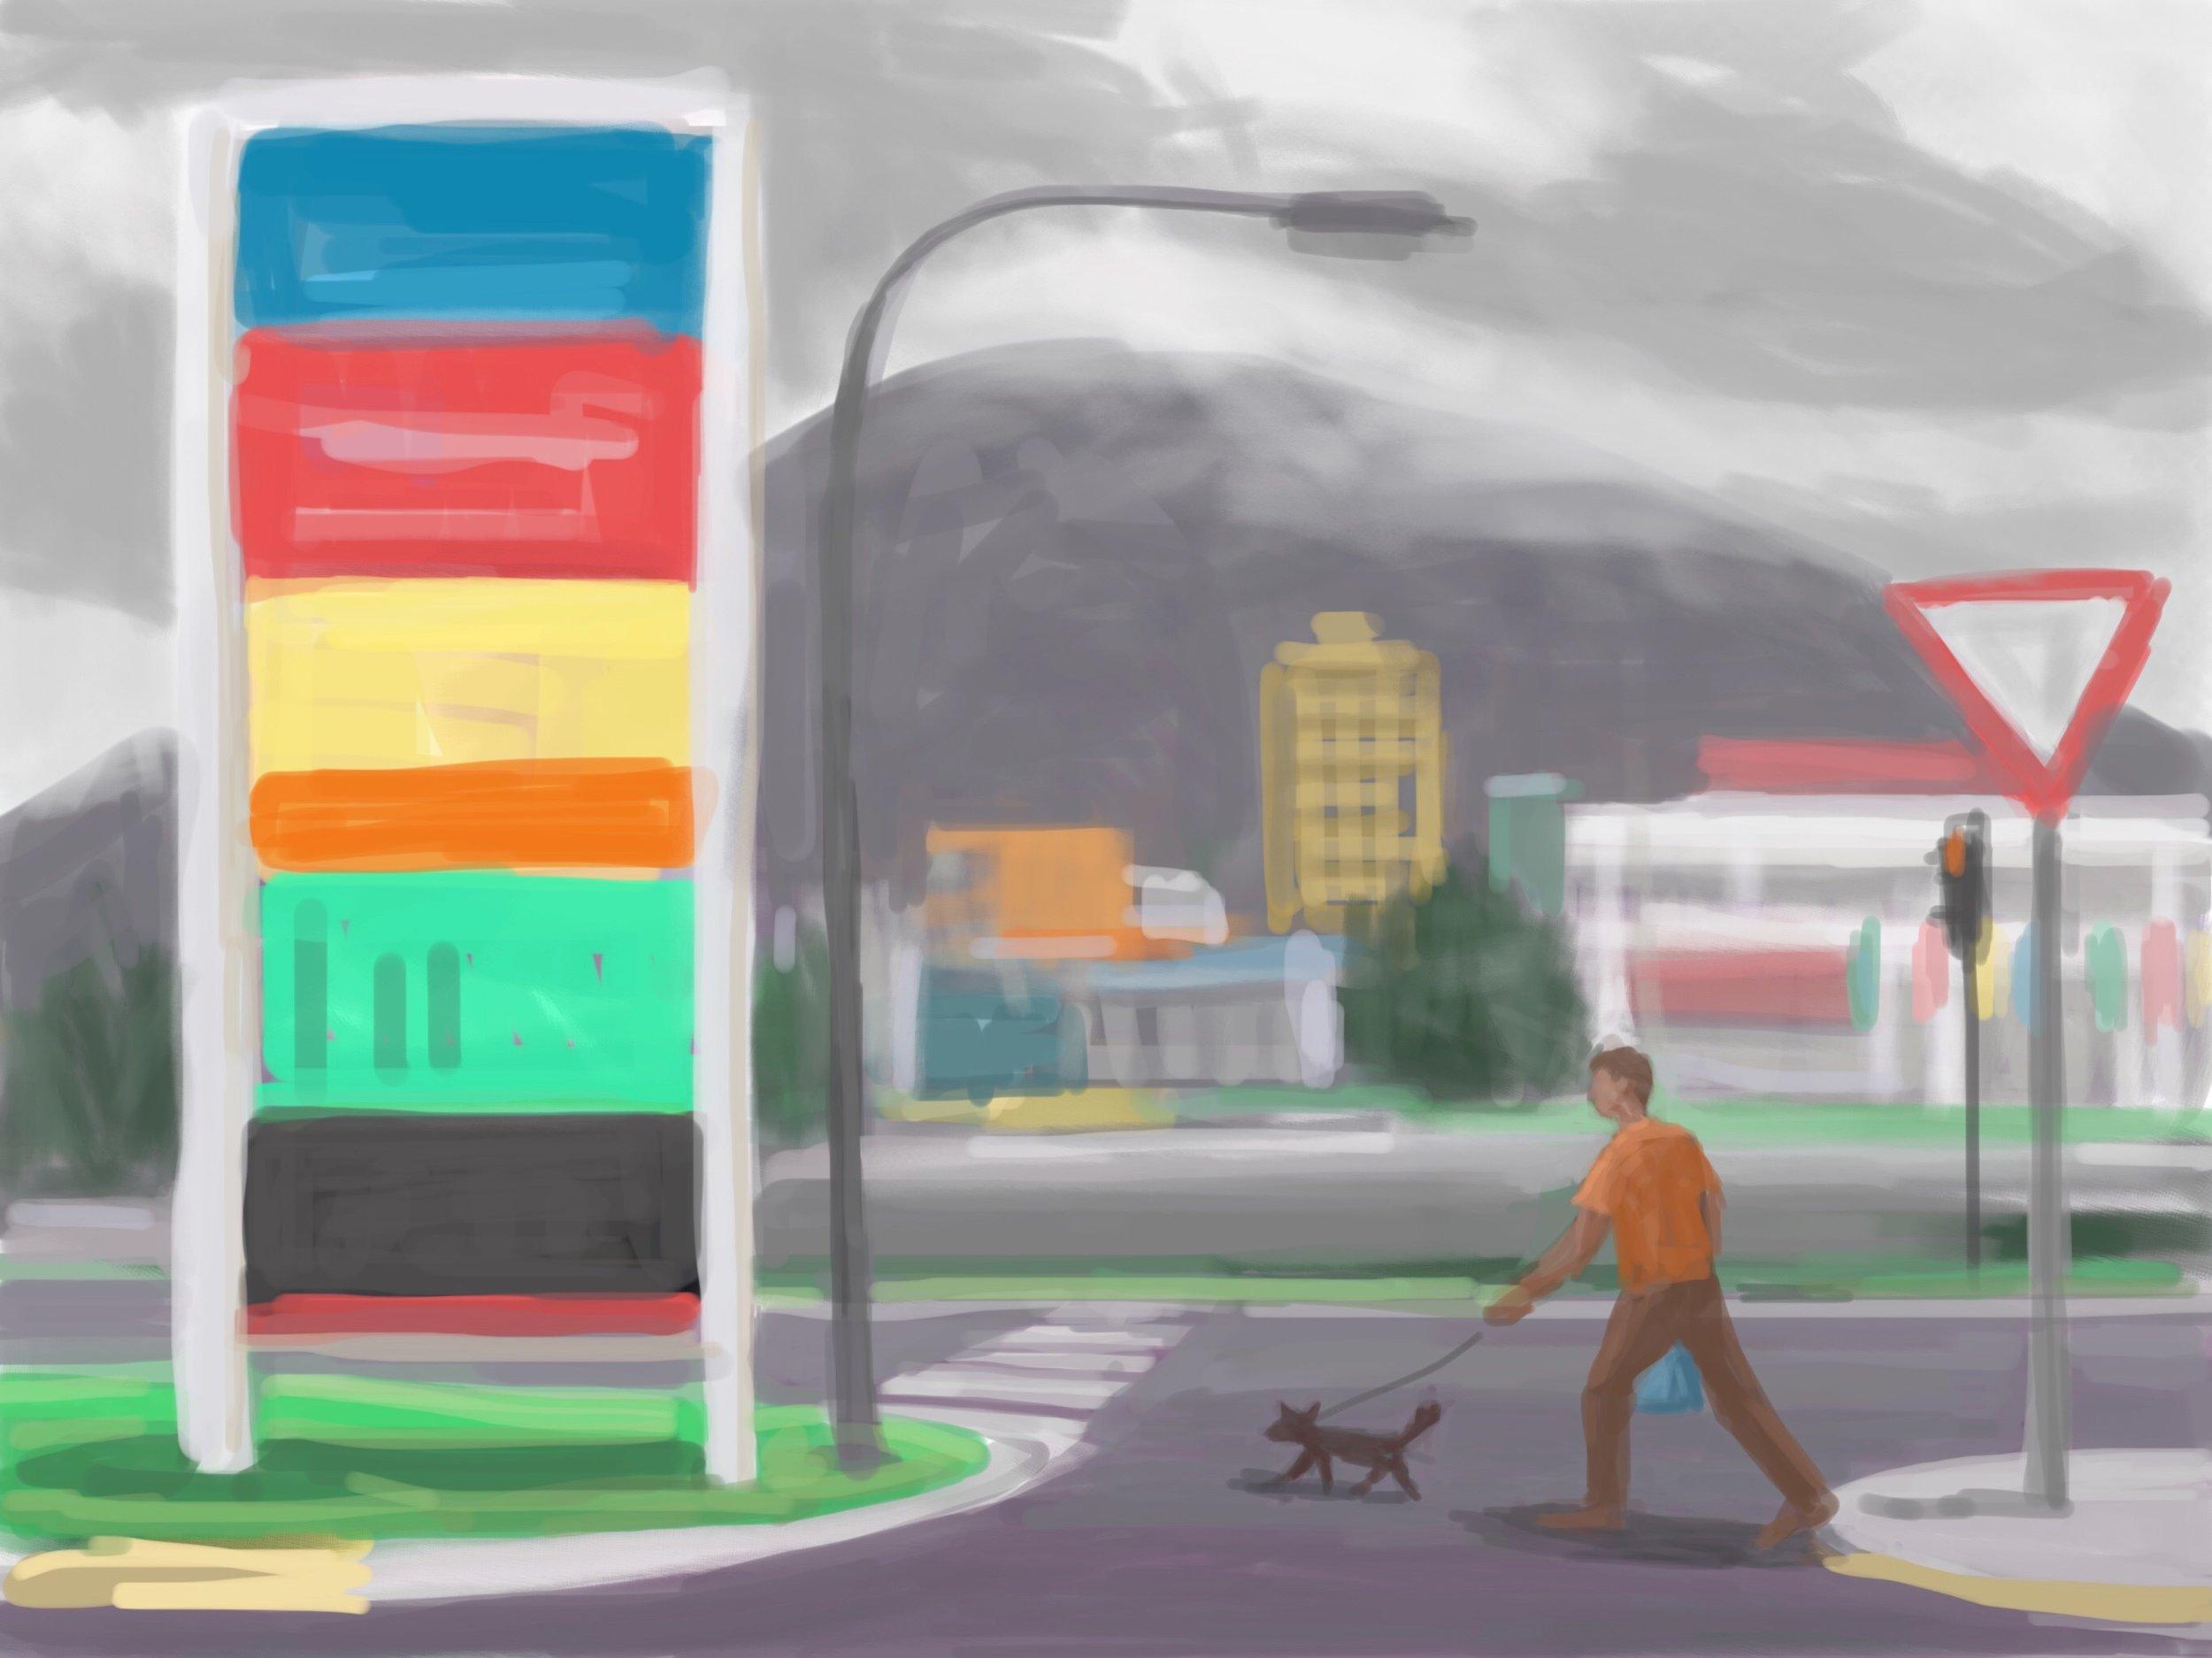 Peter Lankas  Tropics walk 2017 ipad drawing, archival inkjet print, edition of 10 42 x 52cm